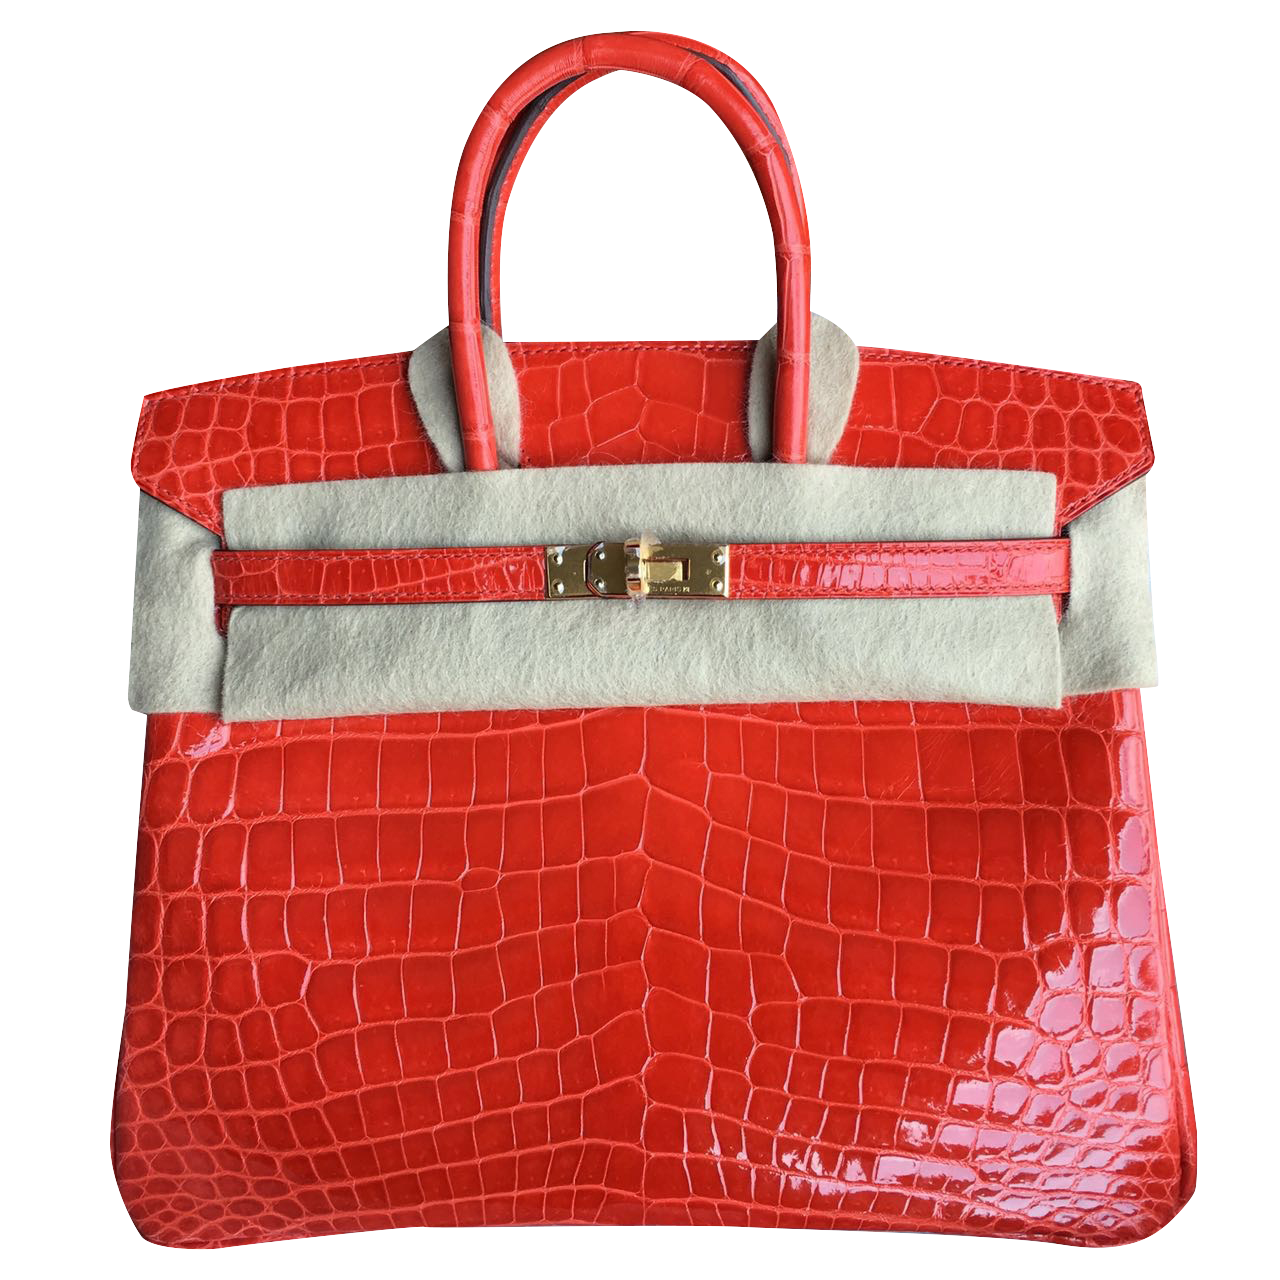 Sac Hermès Birkin 25 Bougainvilliers